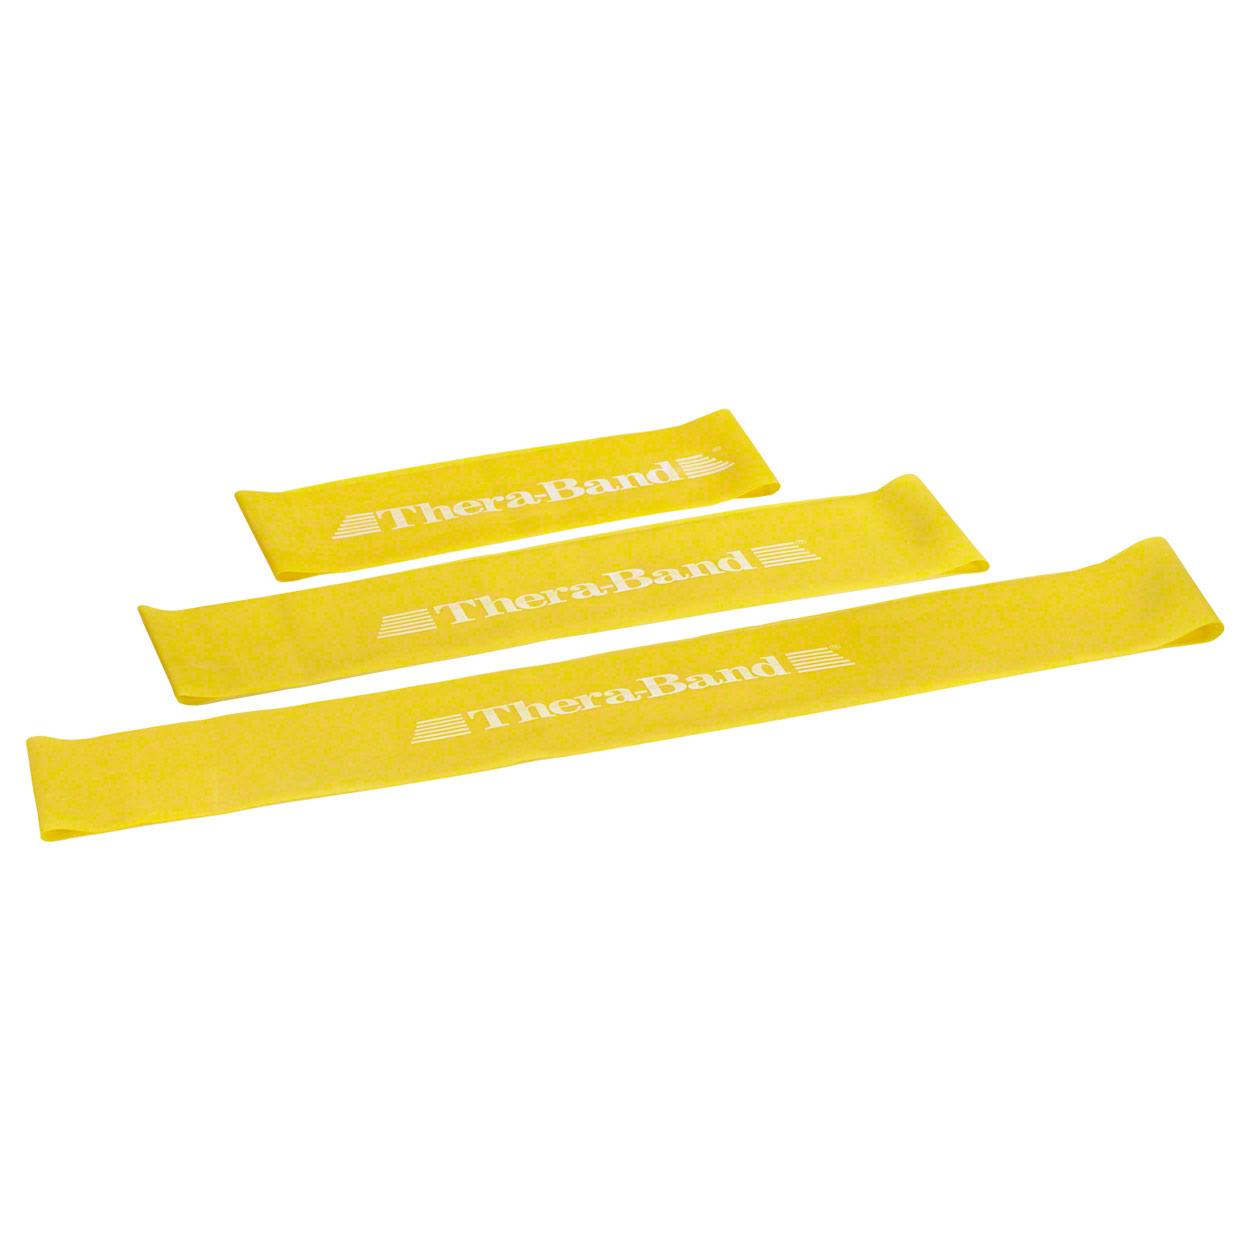 Thera-Band Loop, Ø 13 cm, 7.6x20.5 cm, lightweight, yellow - Sport ...